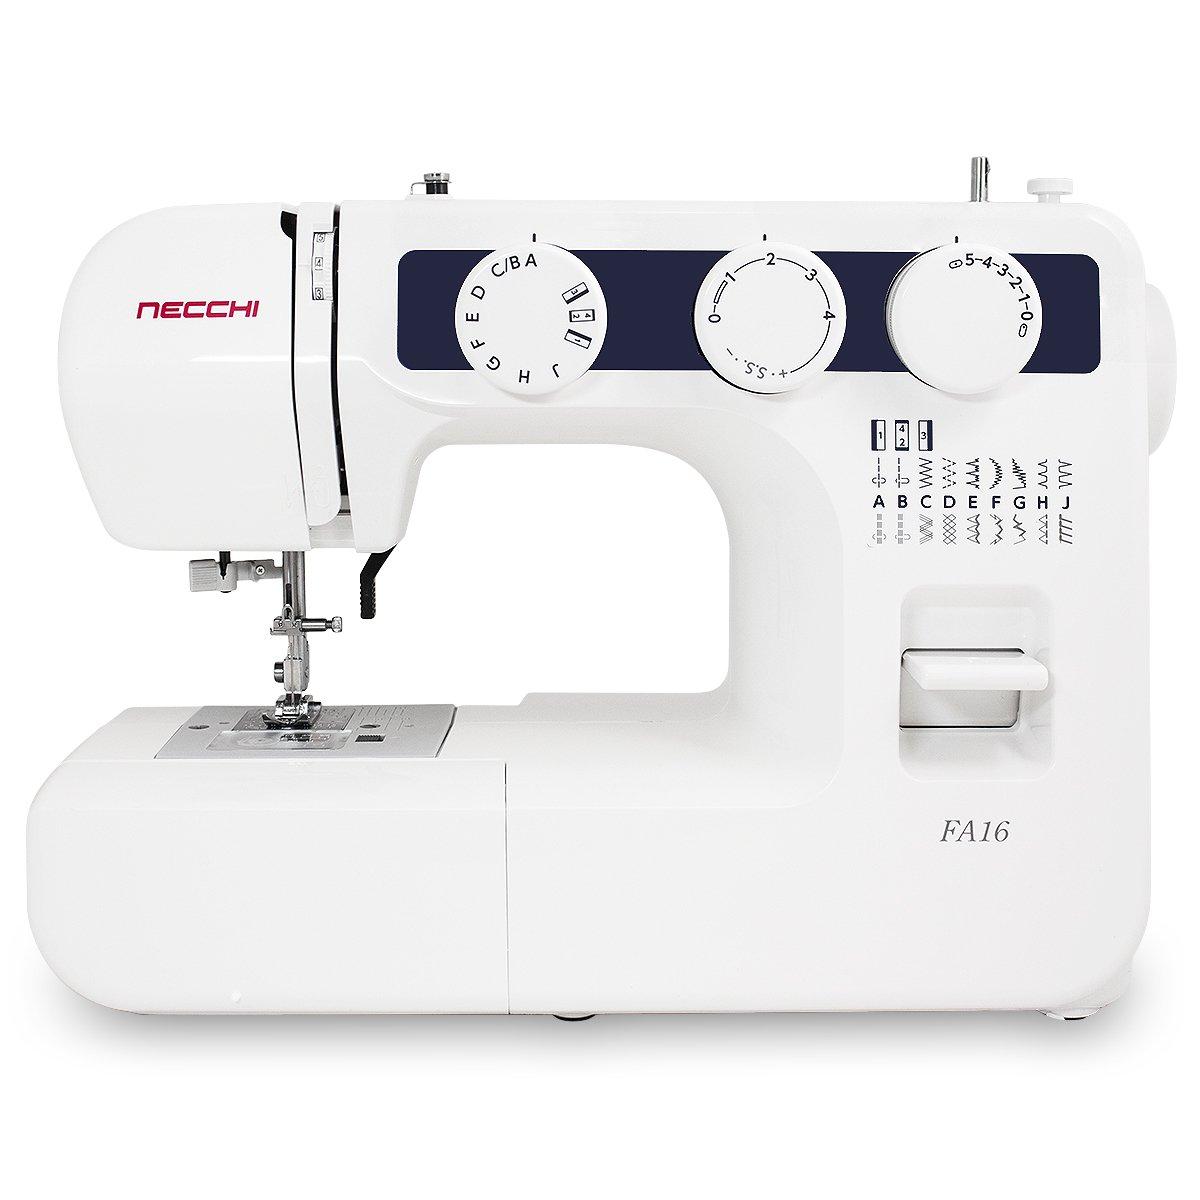 Necchi FA16 Mechanical Sewing Machine